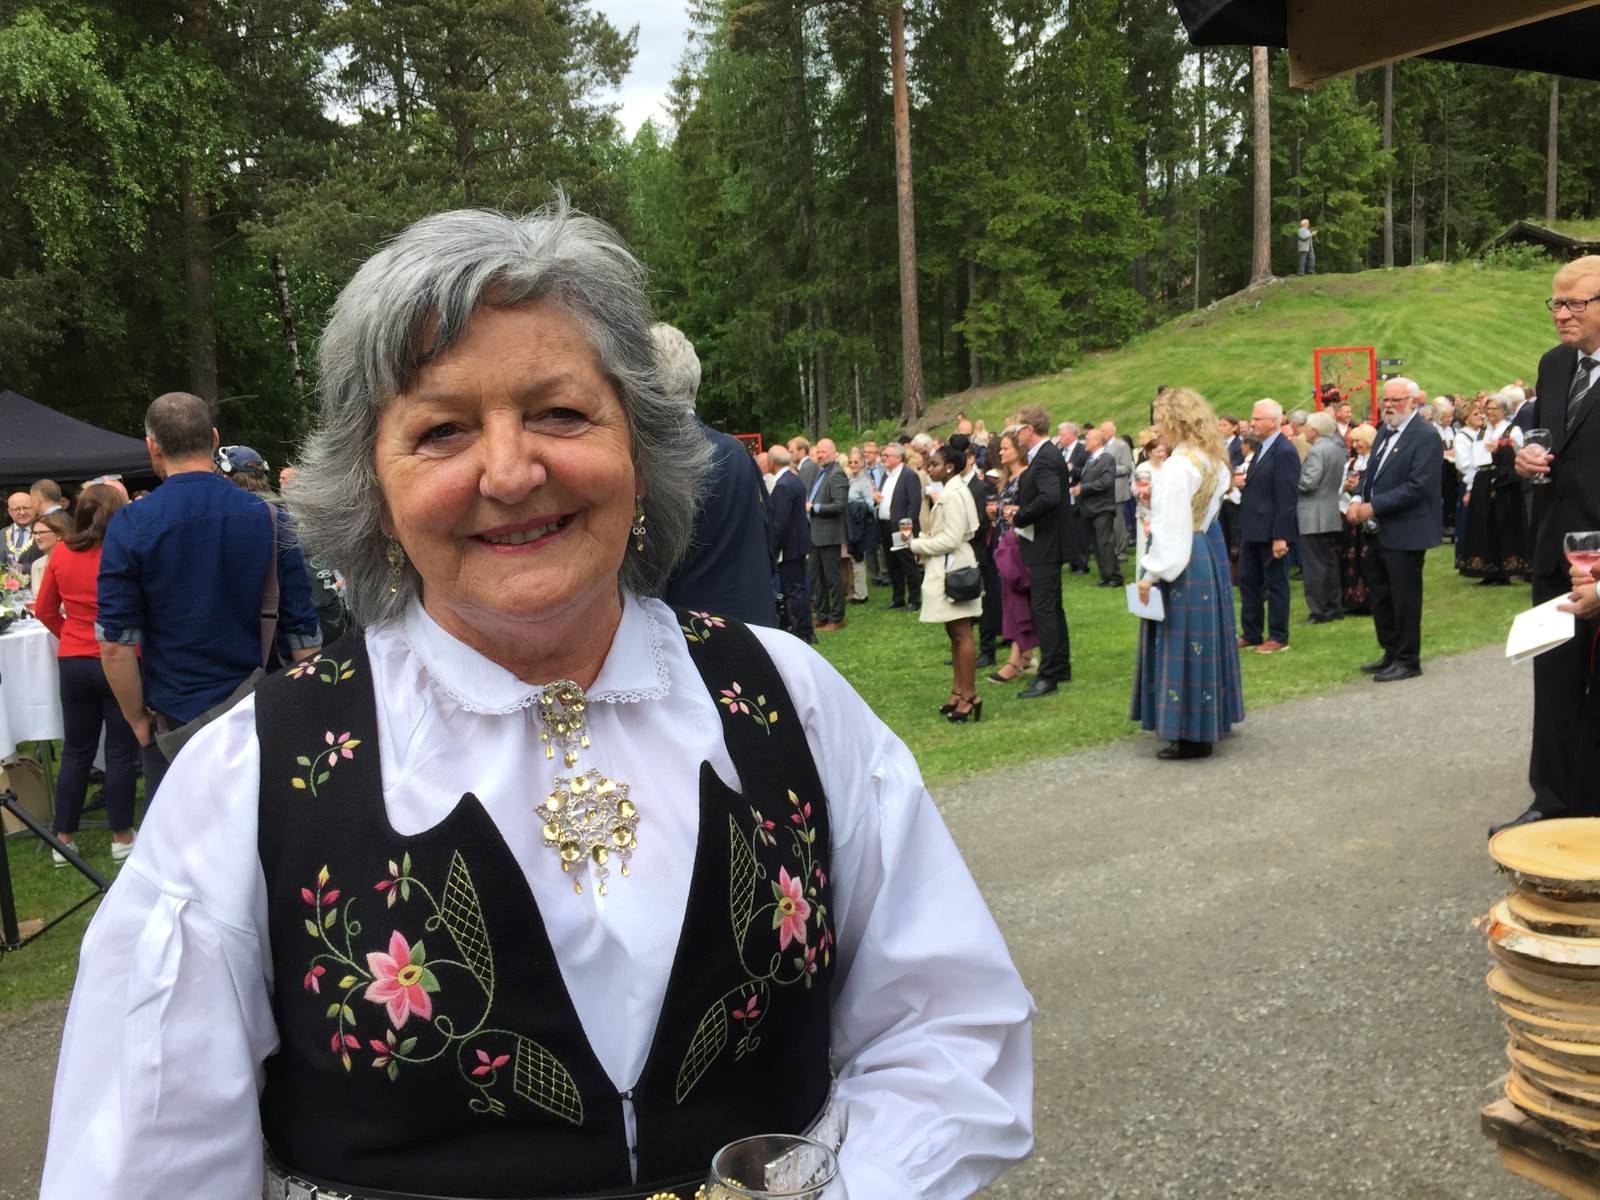 Ingunn Letnes fra Torpa i Nordre Land hadde skaffet seg helt ny bunad til hagefesten.